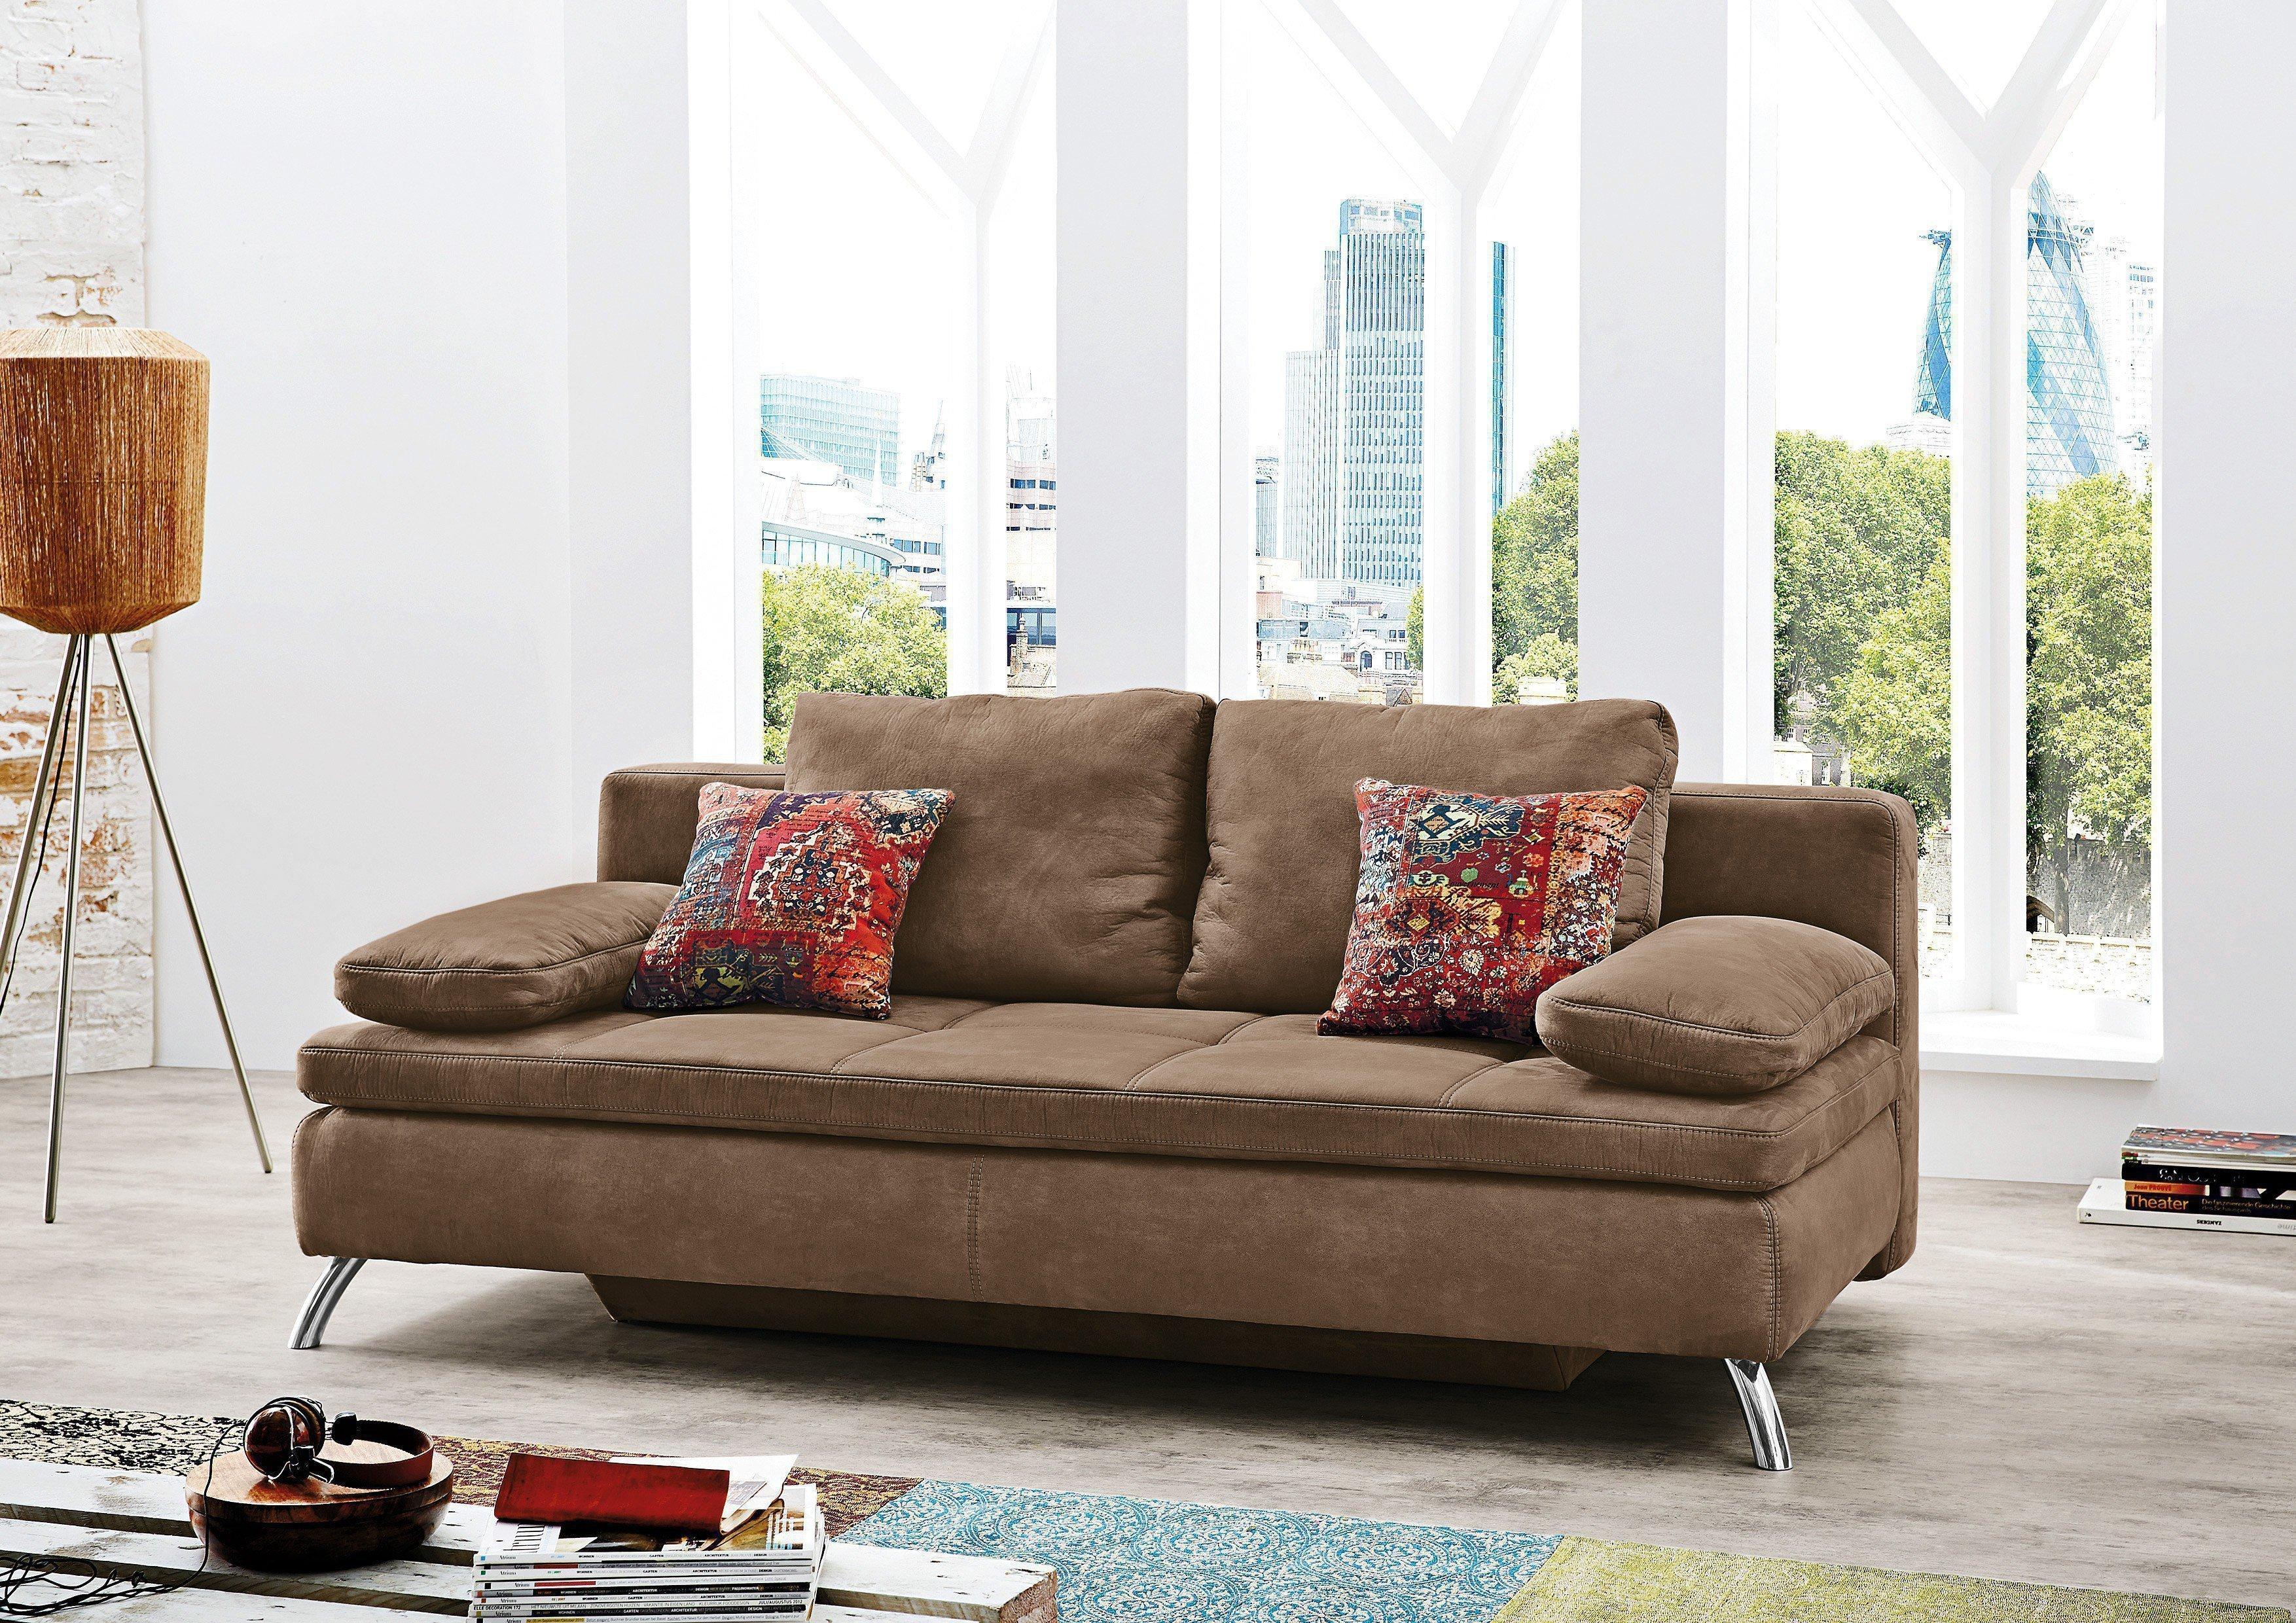 jockenh fer jamaika bakersfield schlafsofa hellbraun mit bettkasten m bel letz ihr online shop. Black Bedroom Furniture Sets. Home Design Ideas